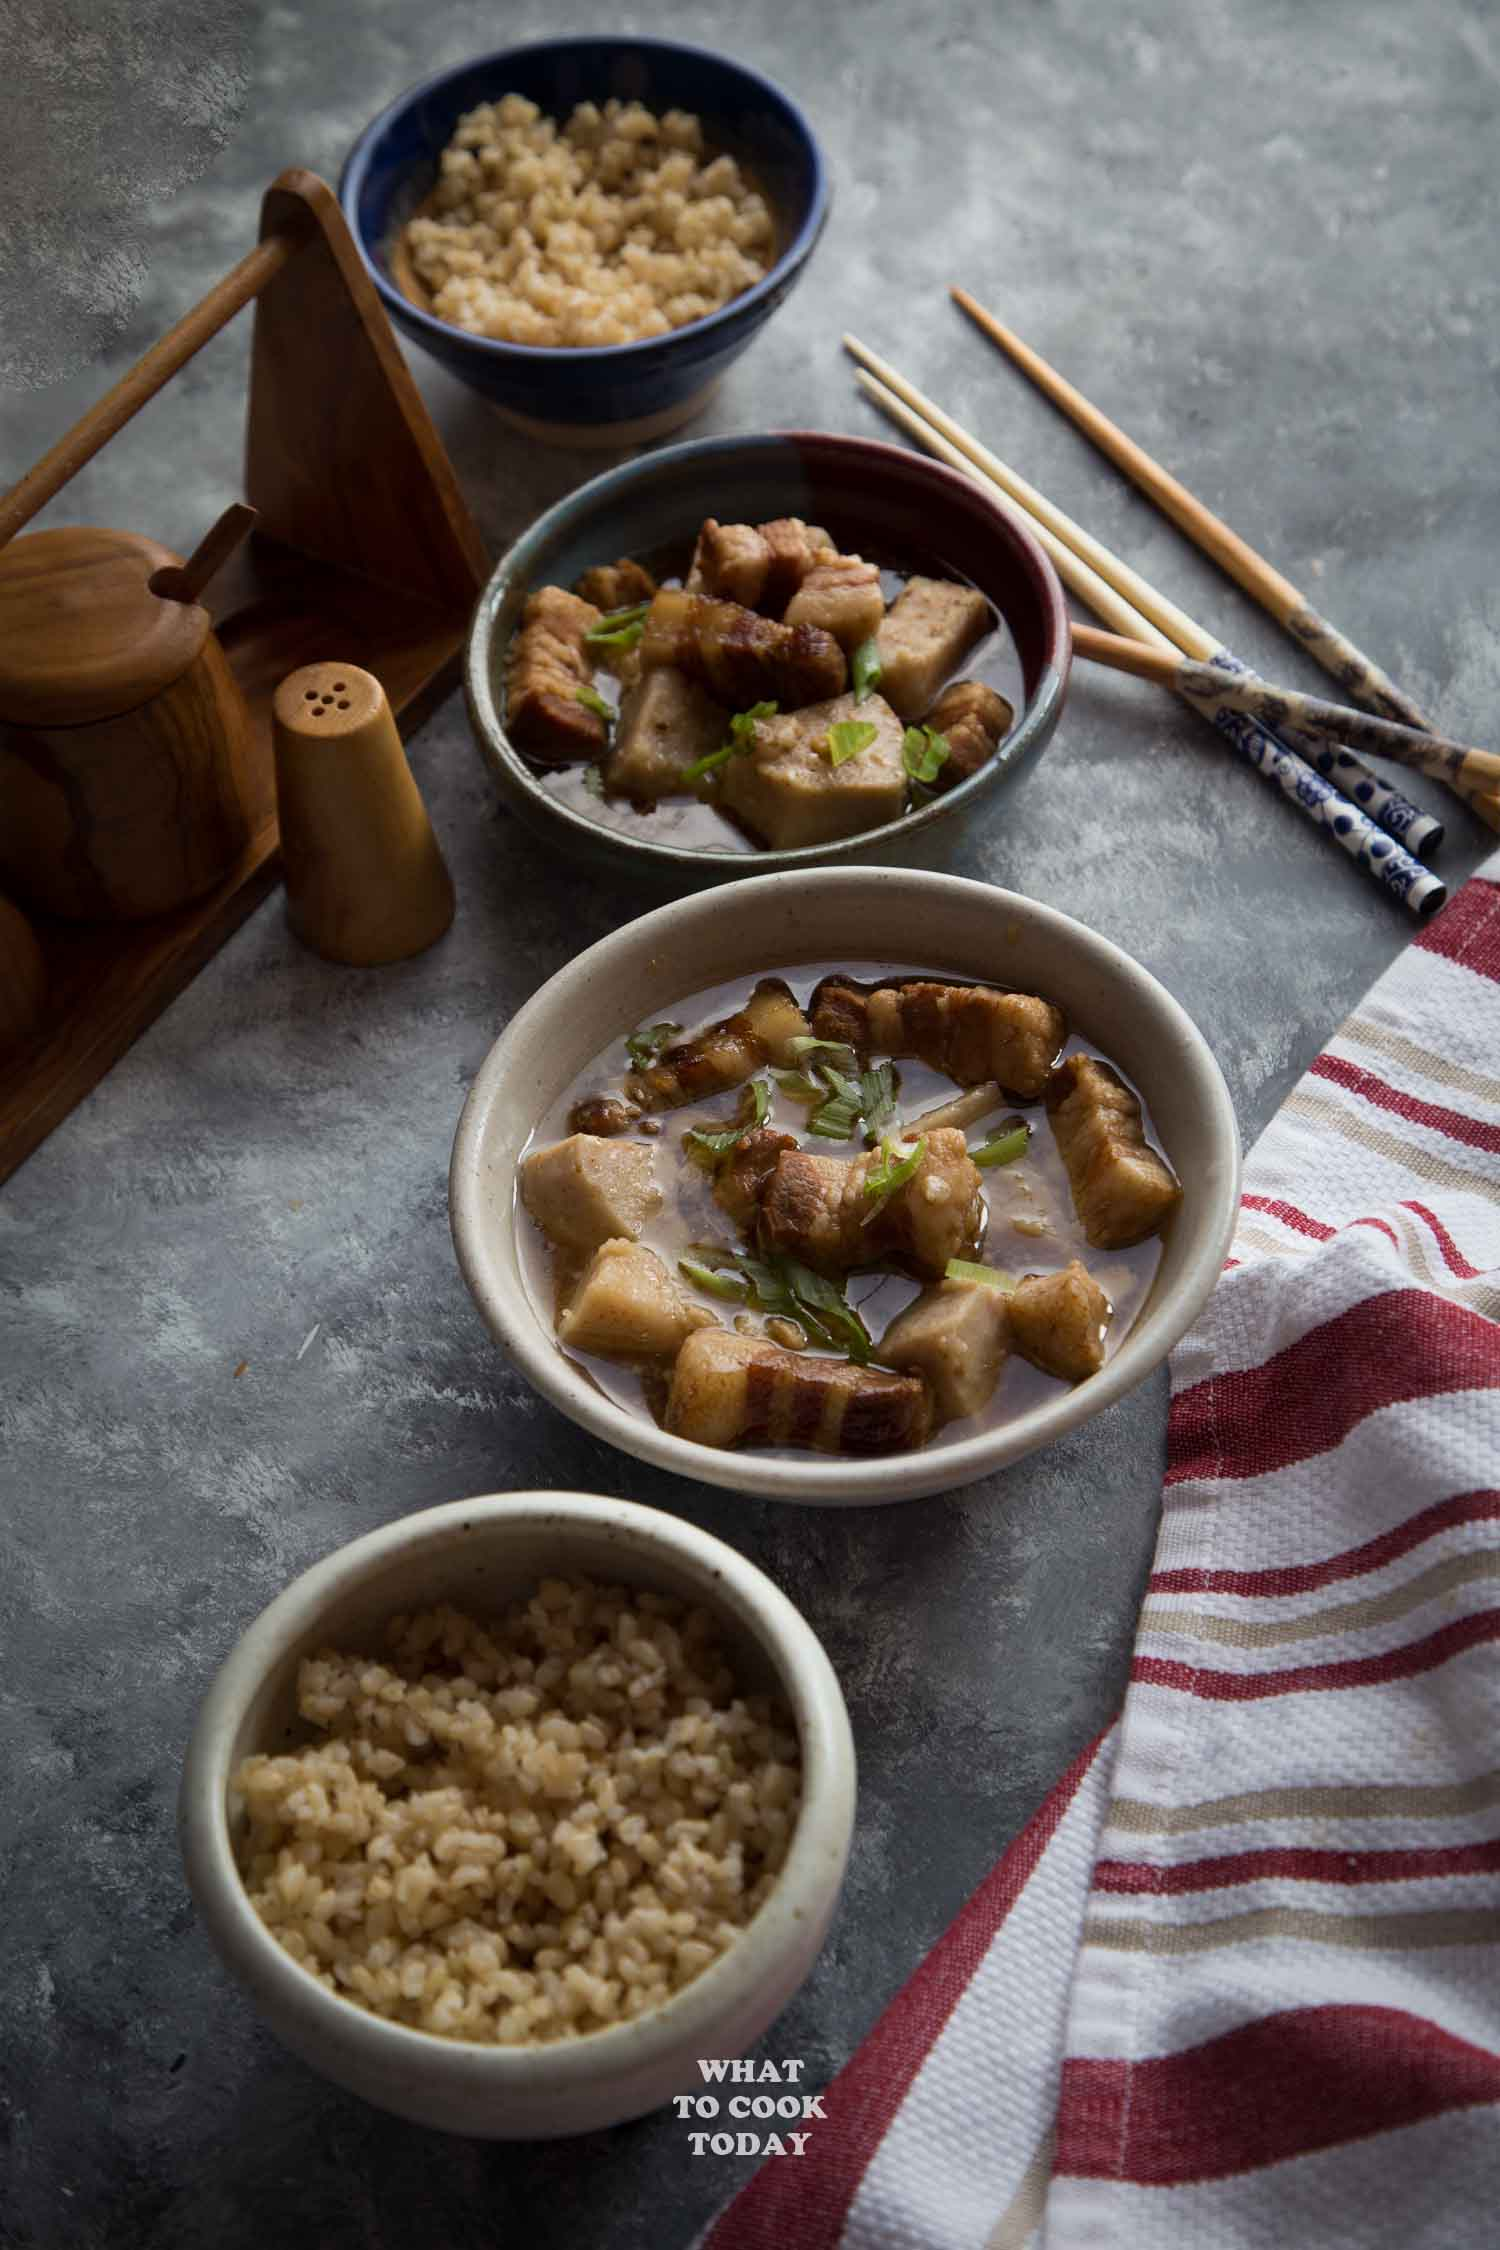 Easy Pressure Cooker Braised Pork with Yam (Taro)